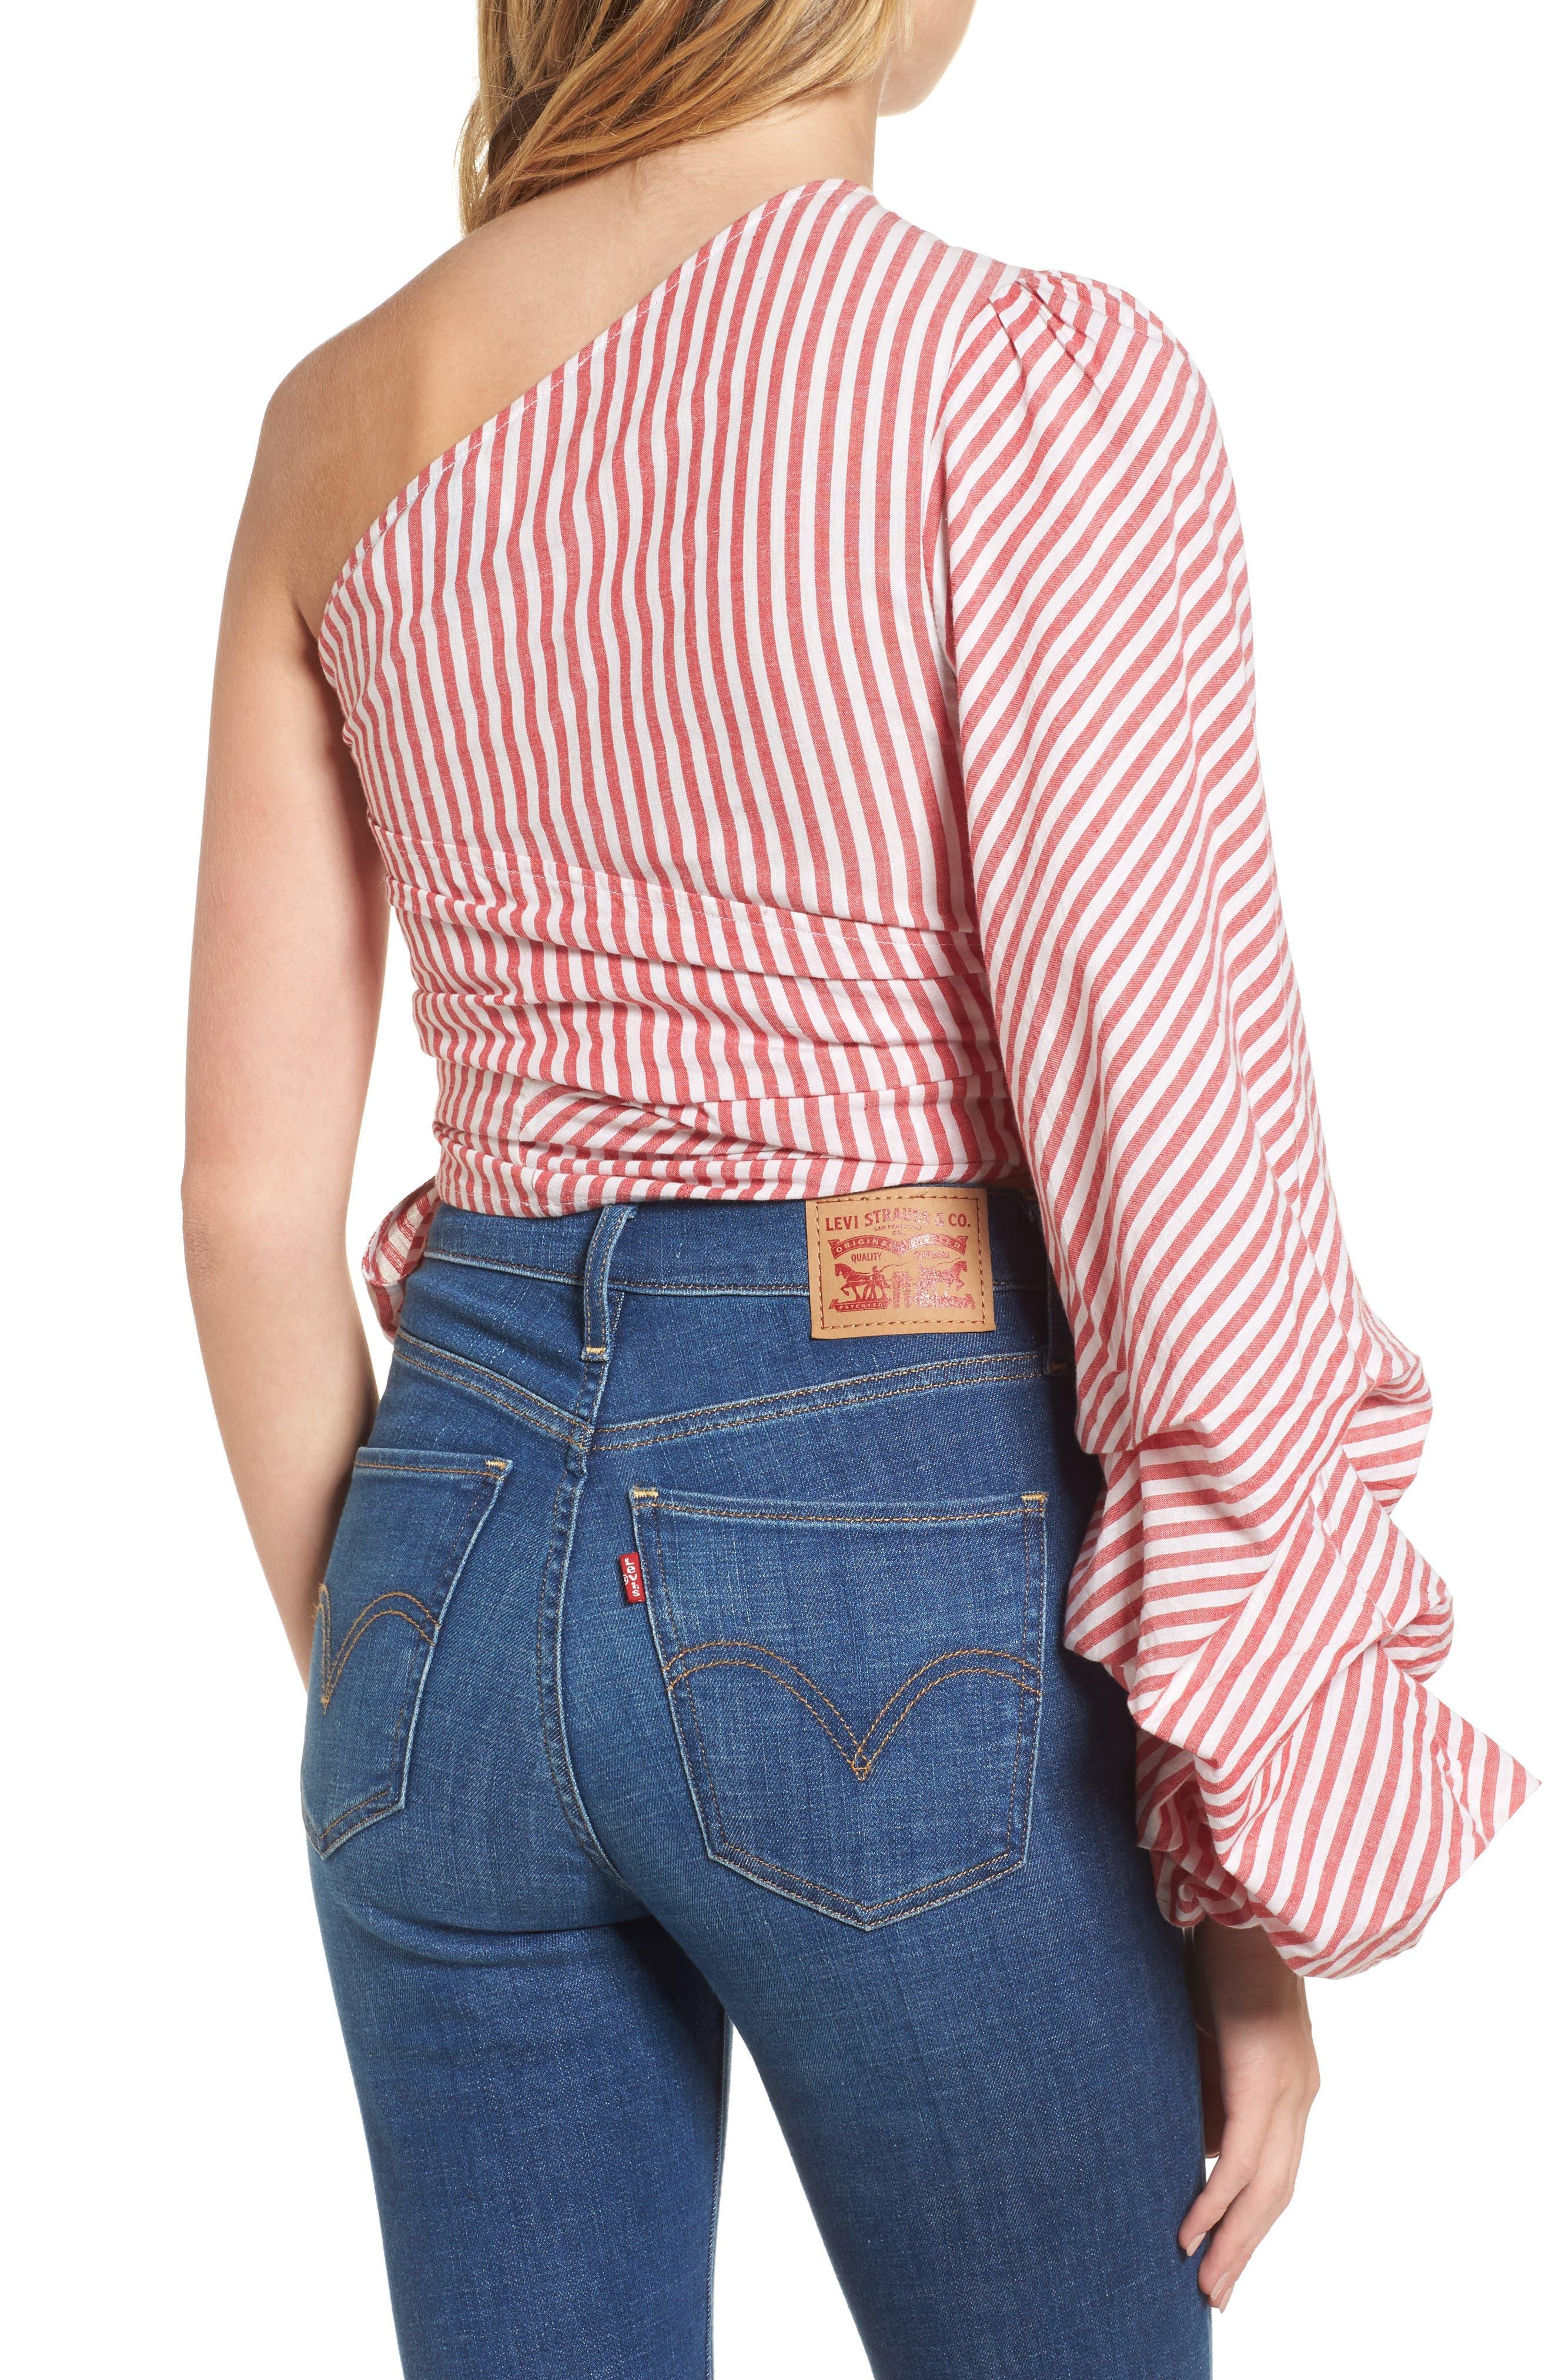 L'Academie Reckless One-Shoulder Wrap Blouse,                             Alternate thumbnail 2, color,                             Red/ White Stripe